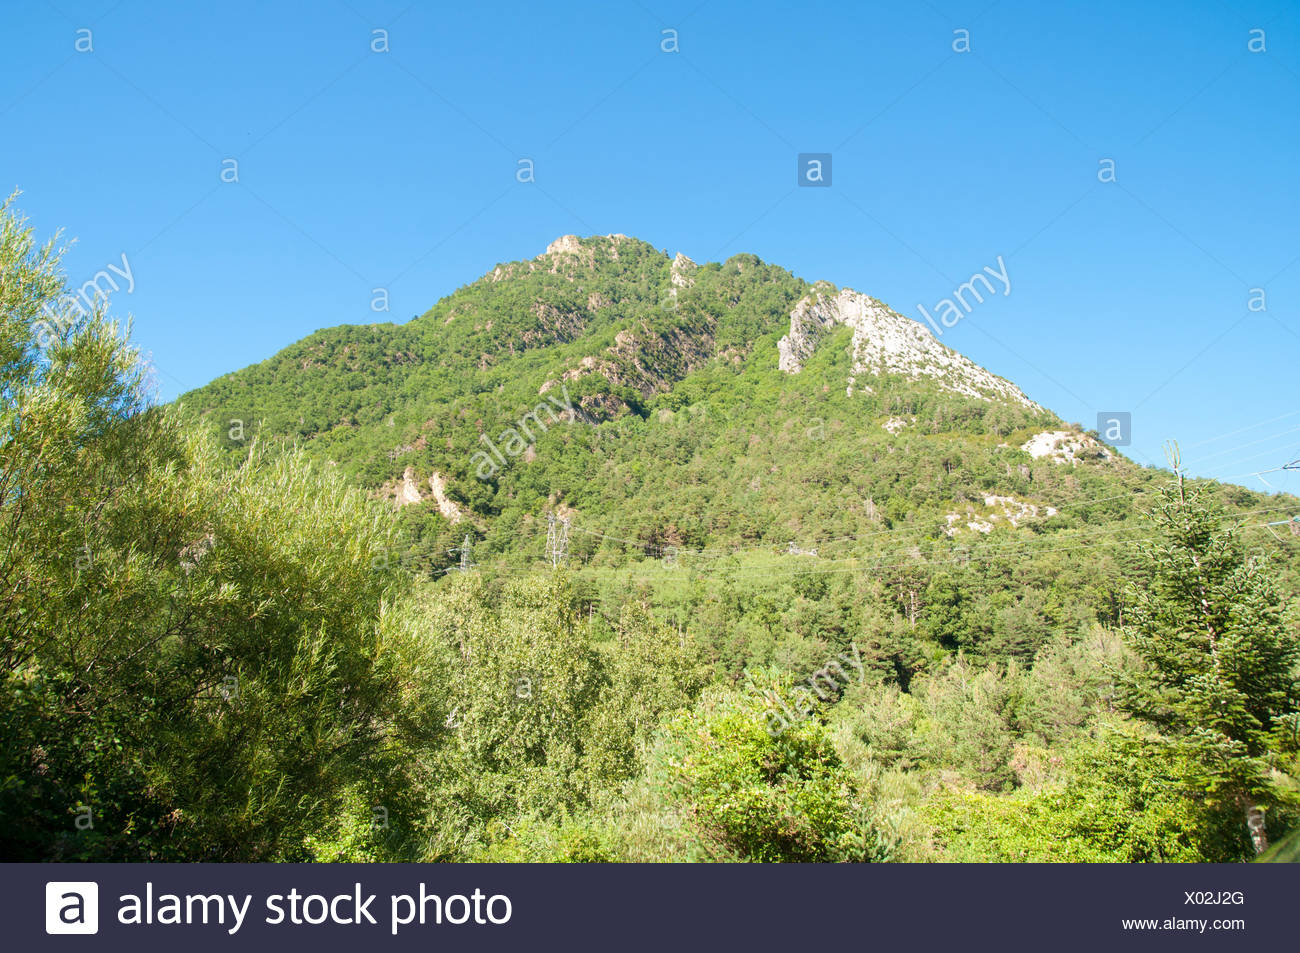 Fuerte de Sta Elena (The fort at Santa Elena), Pyrenees Mountains, Huesca province, Aragon, Spain Stock Photo